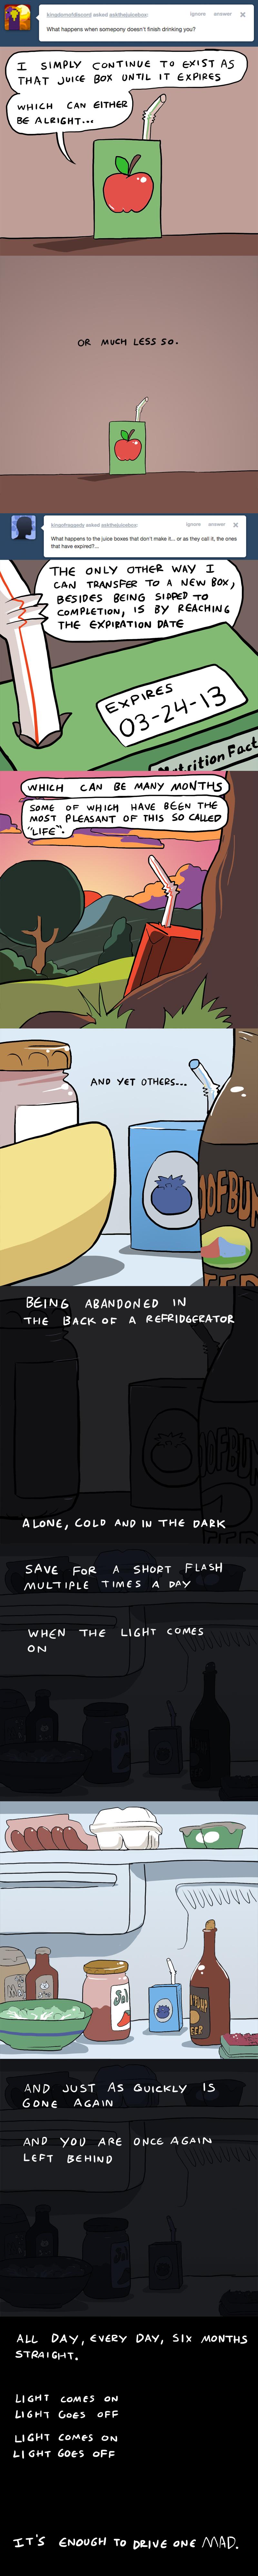 Juicebox Expiration by DocWario